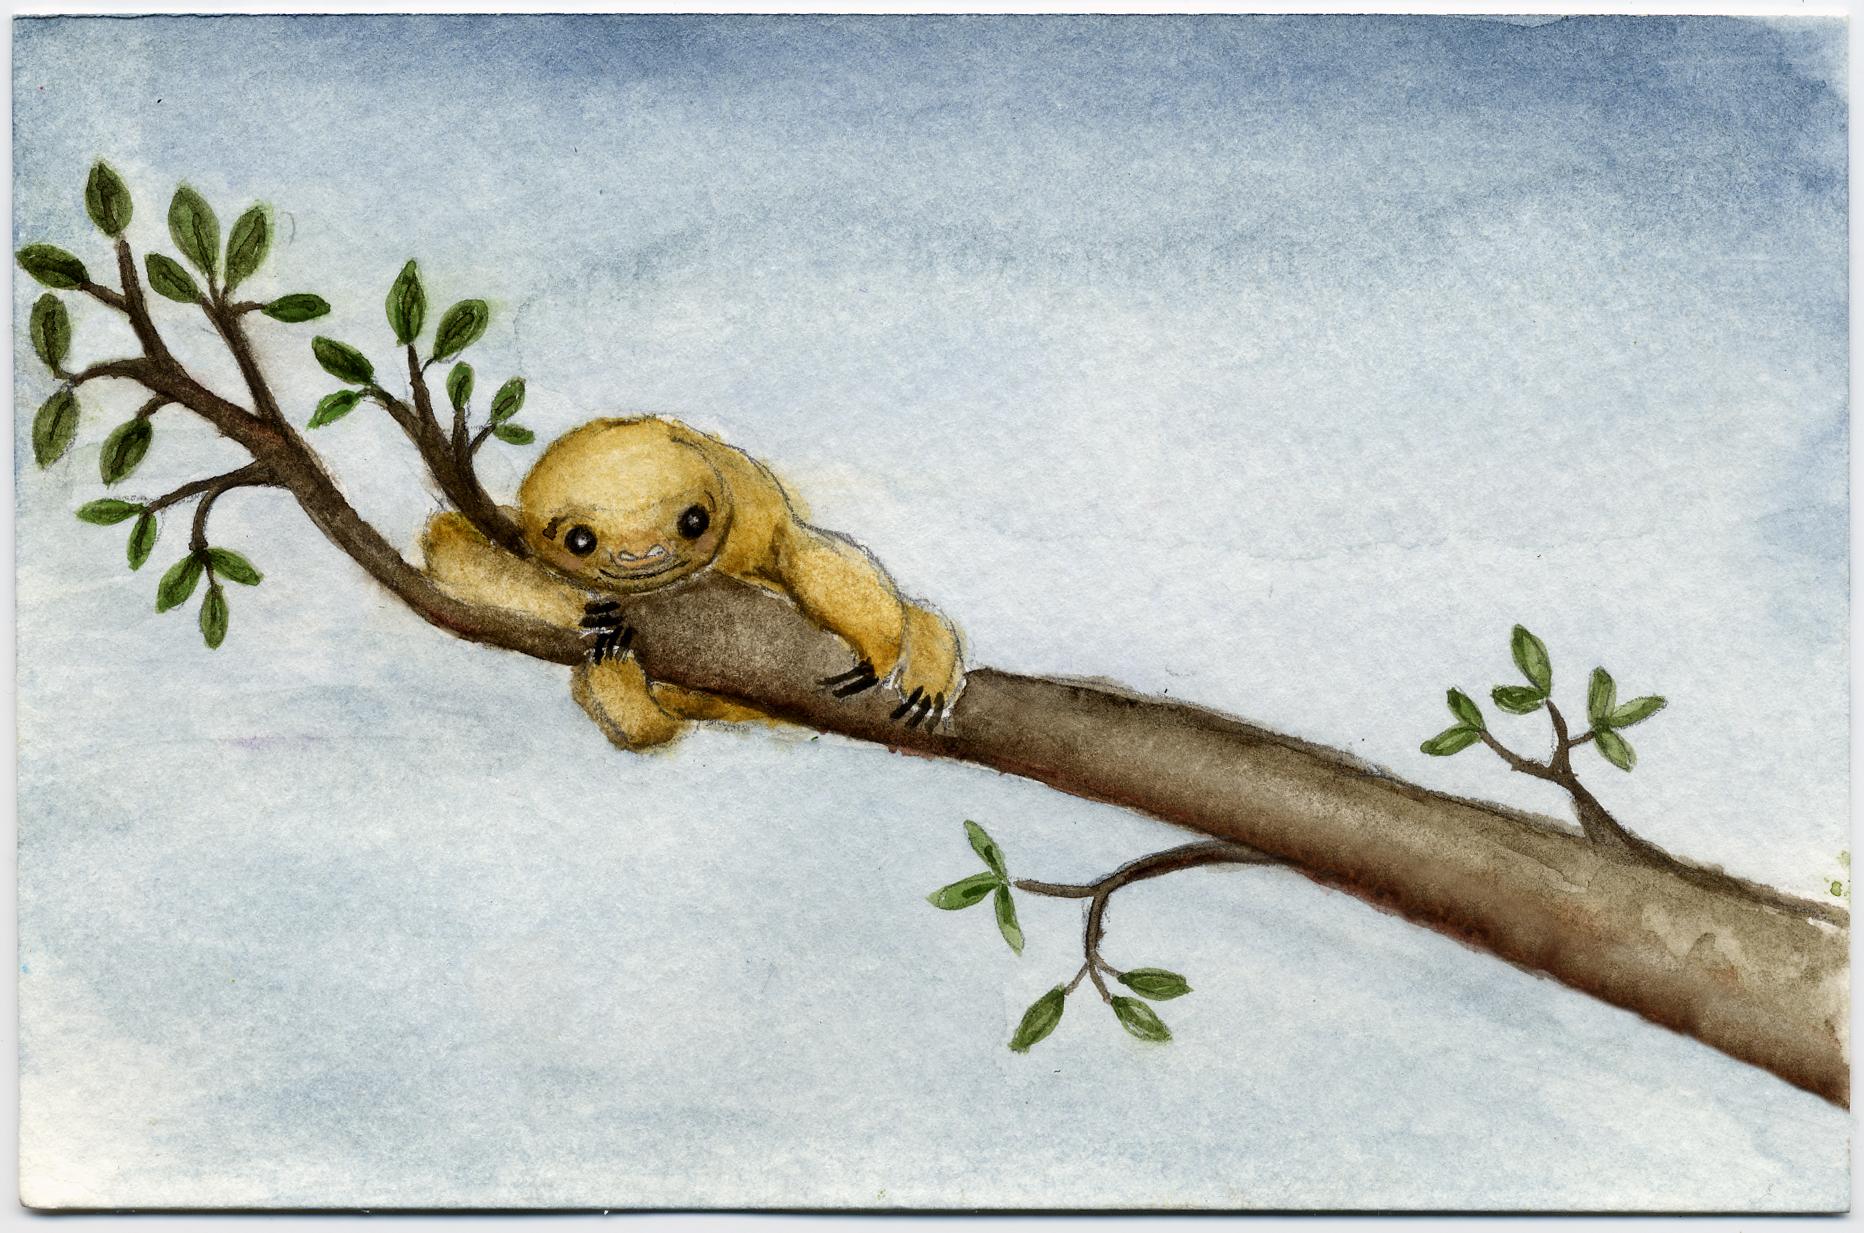 Drawn sloth baby sloth Rock a – Bye of